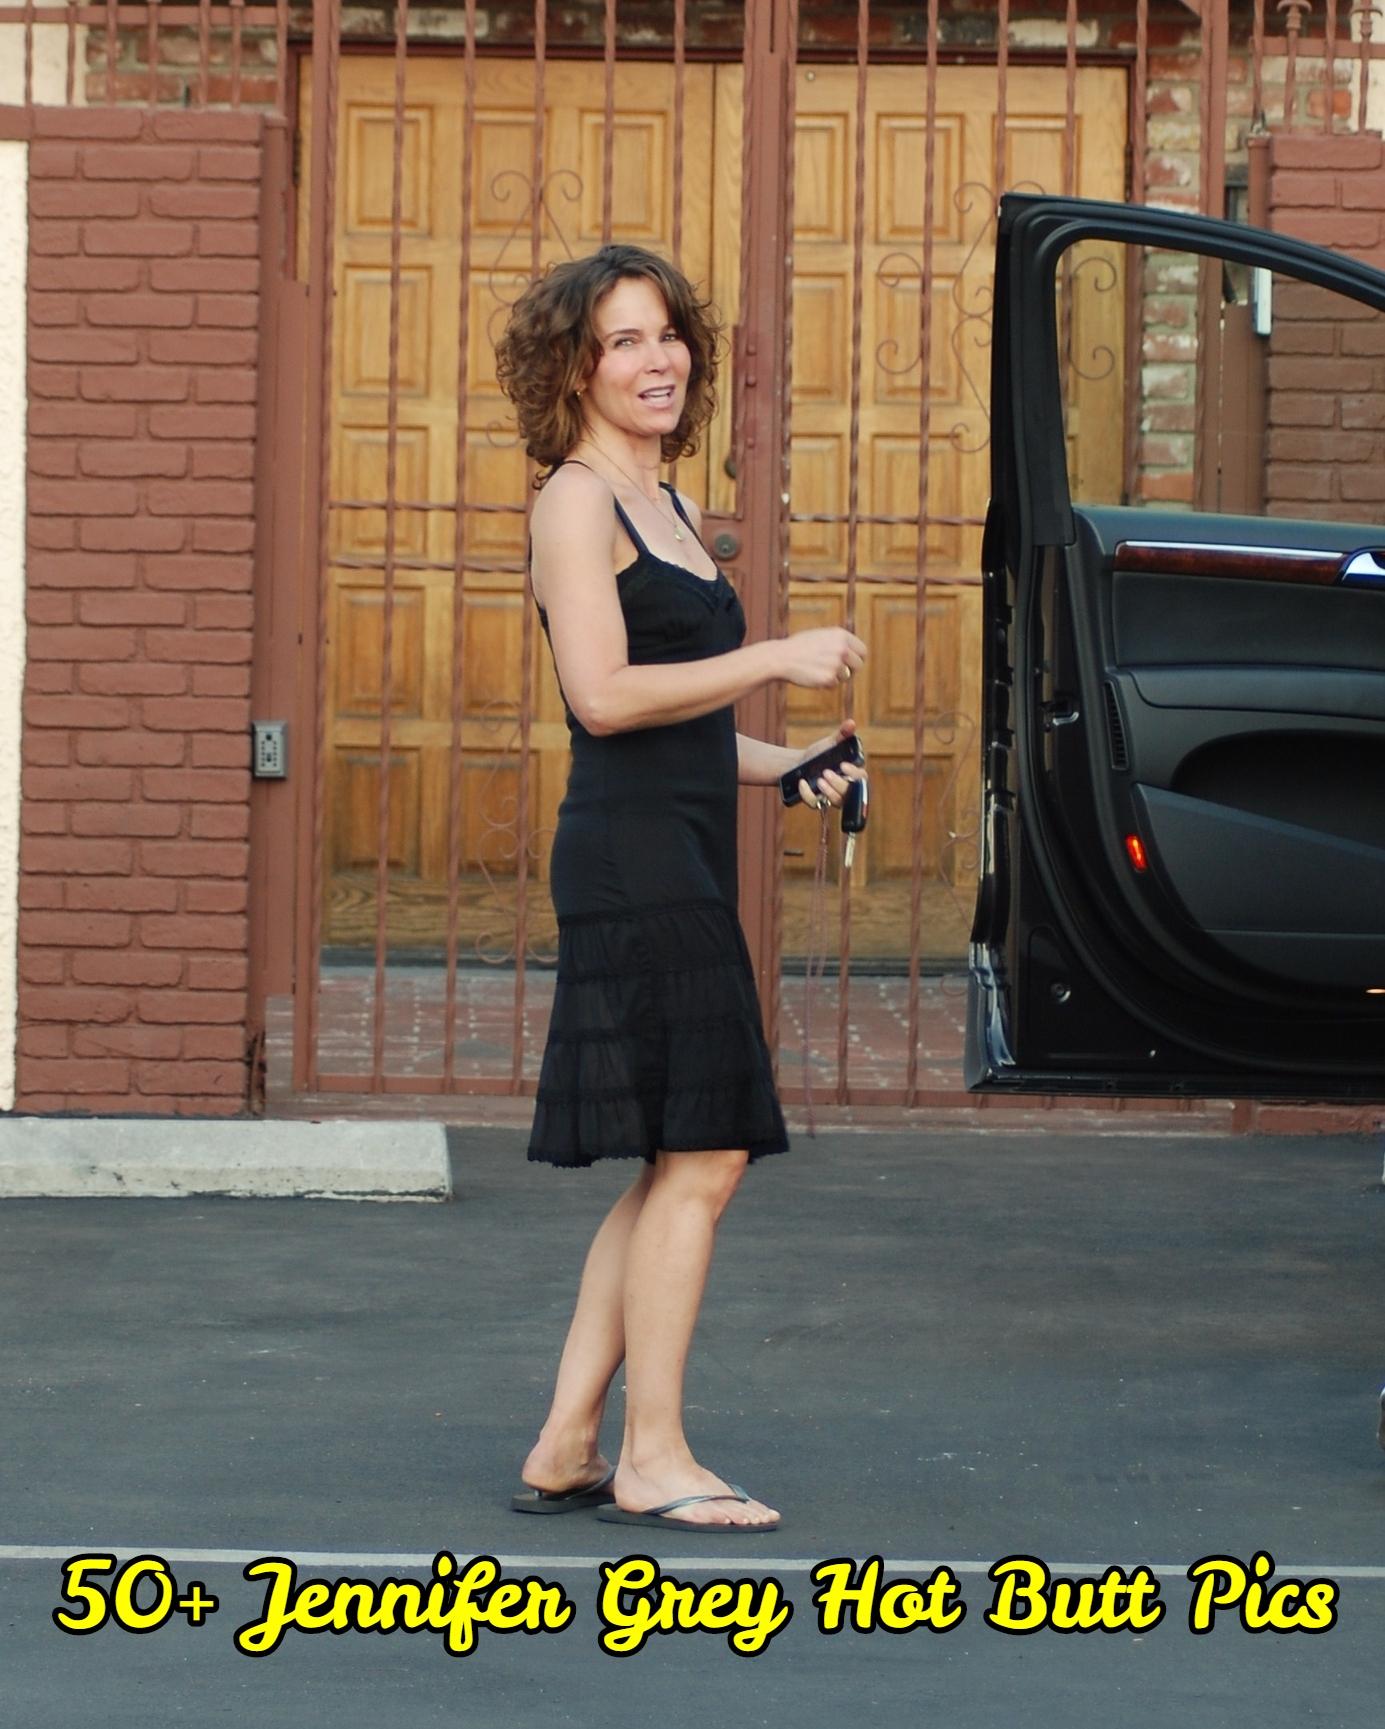 Jennifer Grey Hot Butt Pics